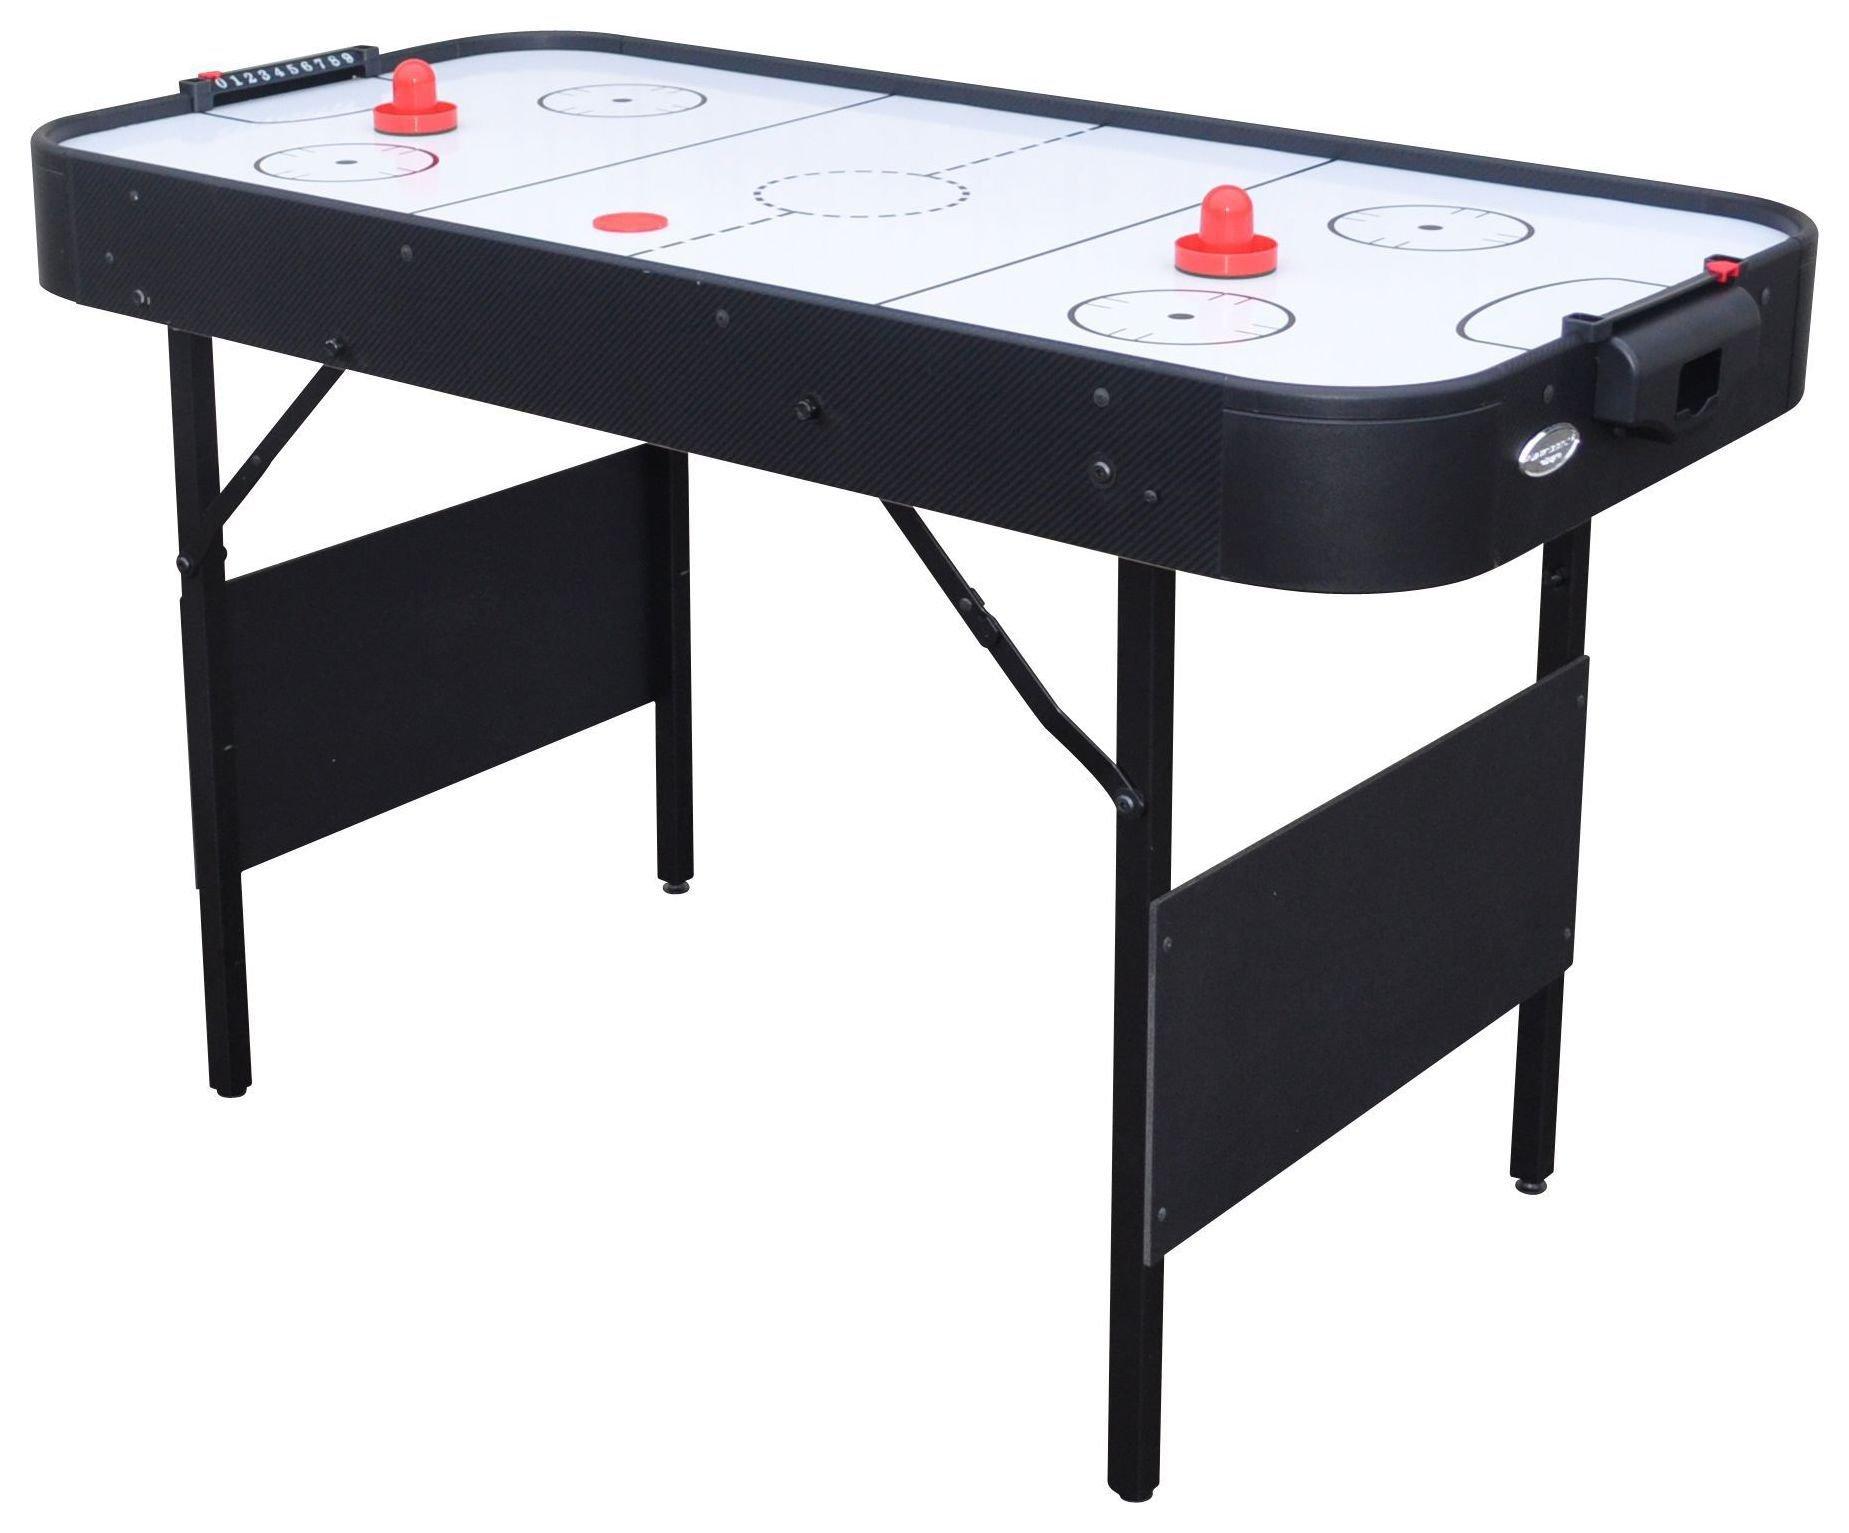 Gamesson Shark Folding Air Hockey Table